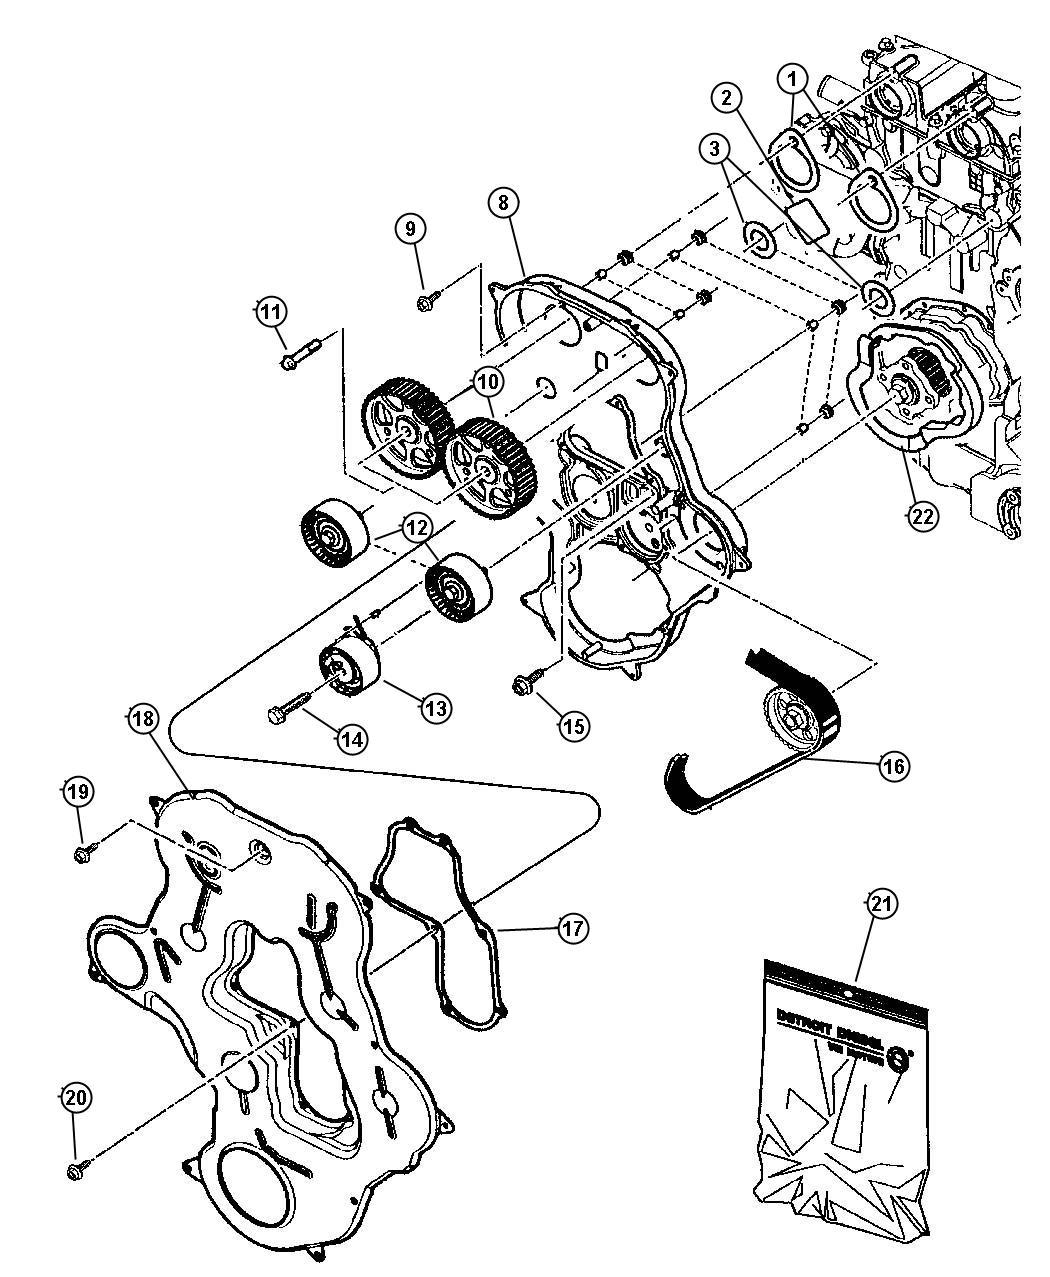 Dodge Caliber Gear Balance Shaft Engine Belt